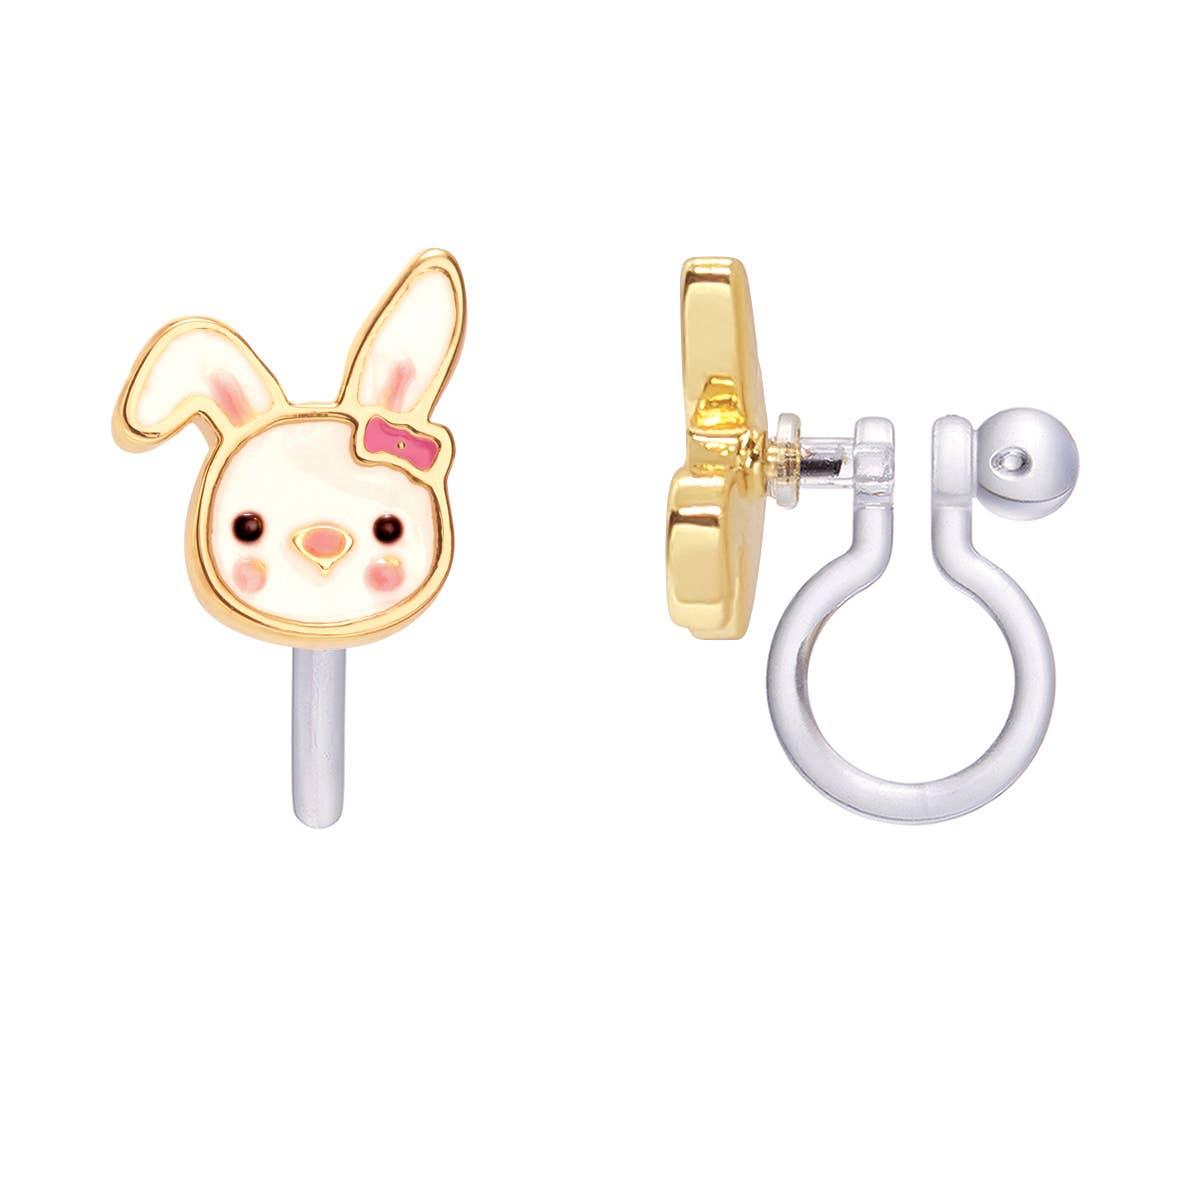 CLIP ON Cutie Earrings- Bouncy Bunny | Trada Marketplace